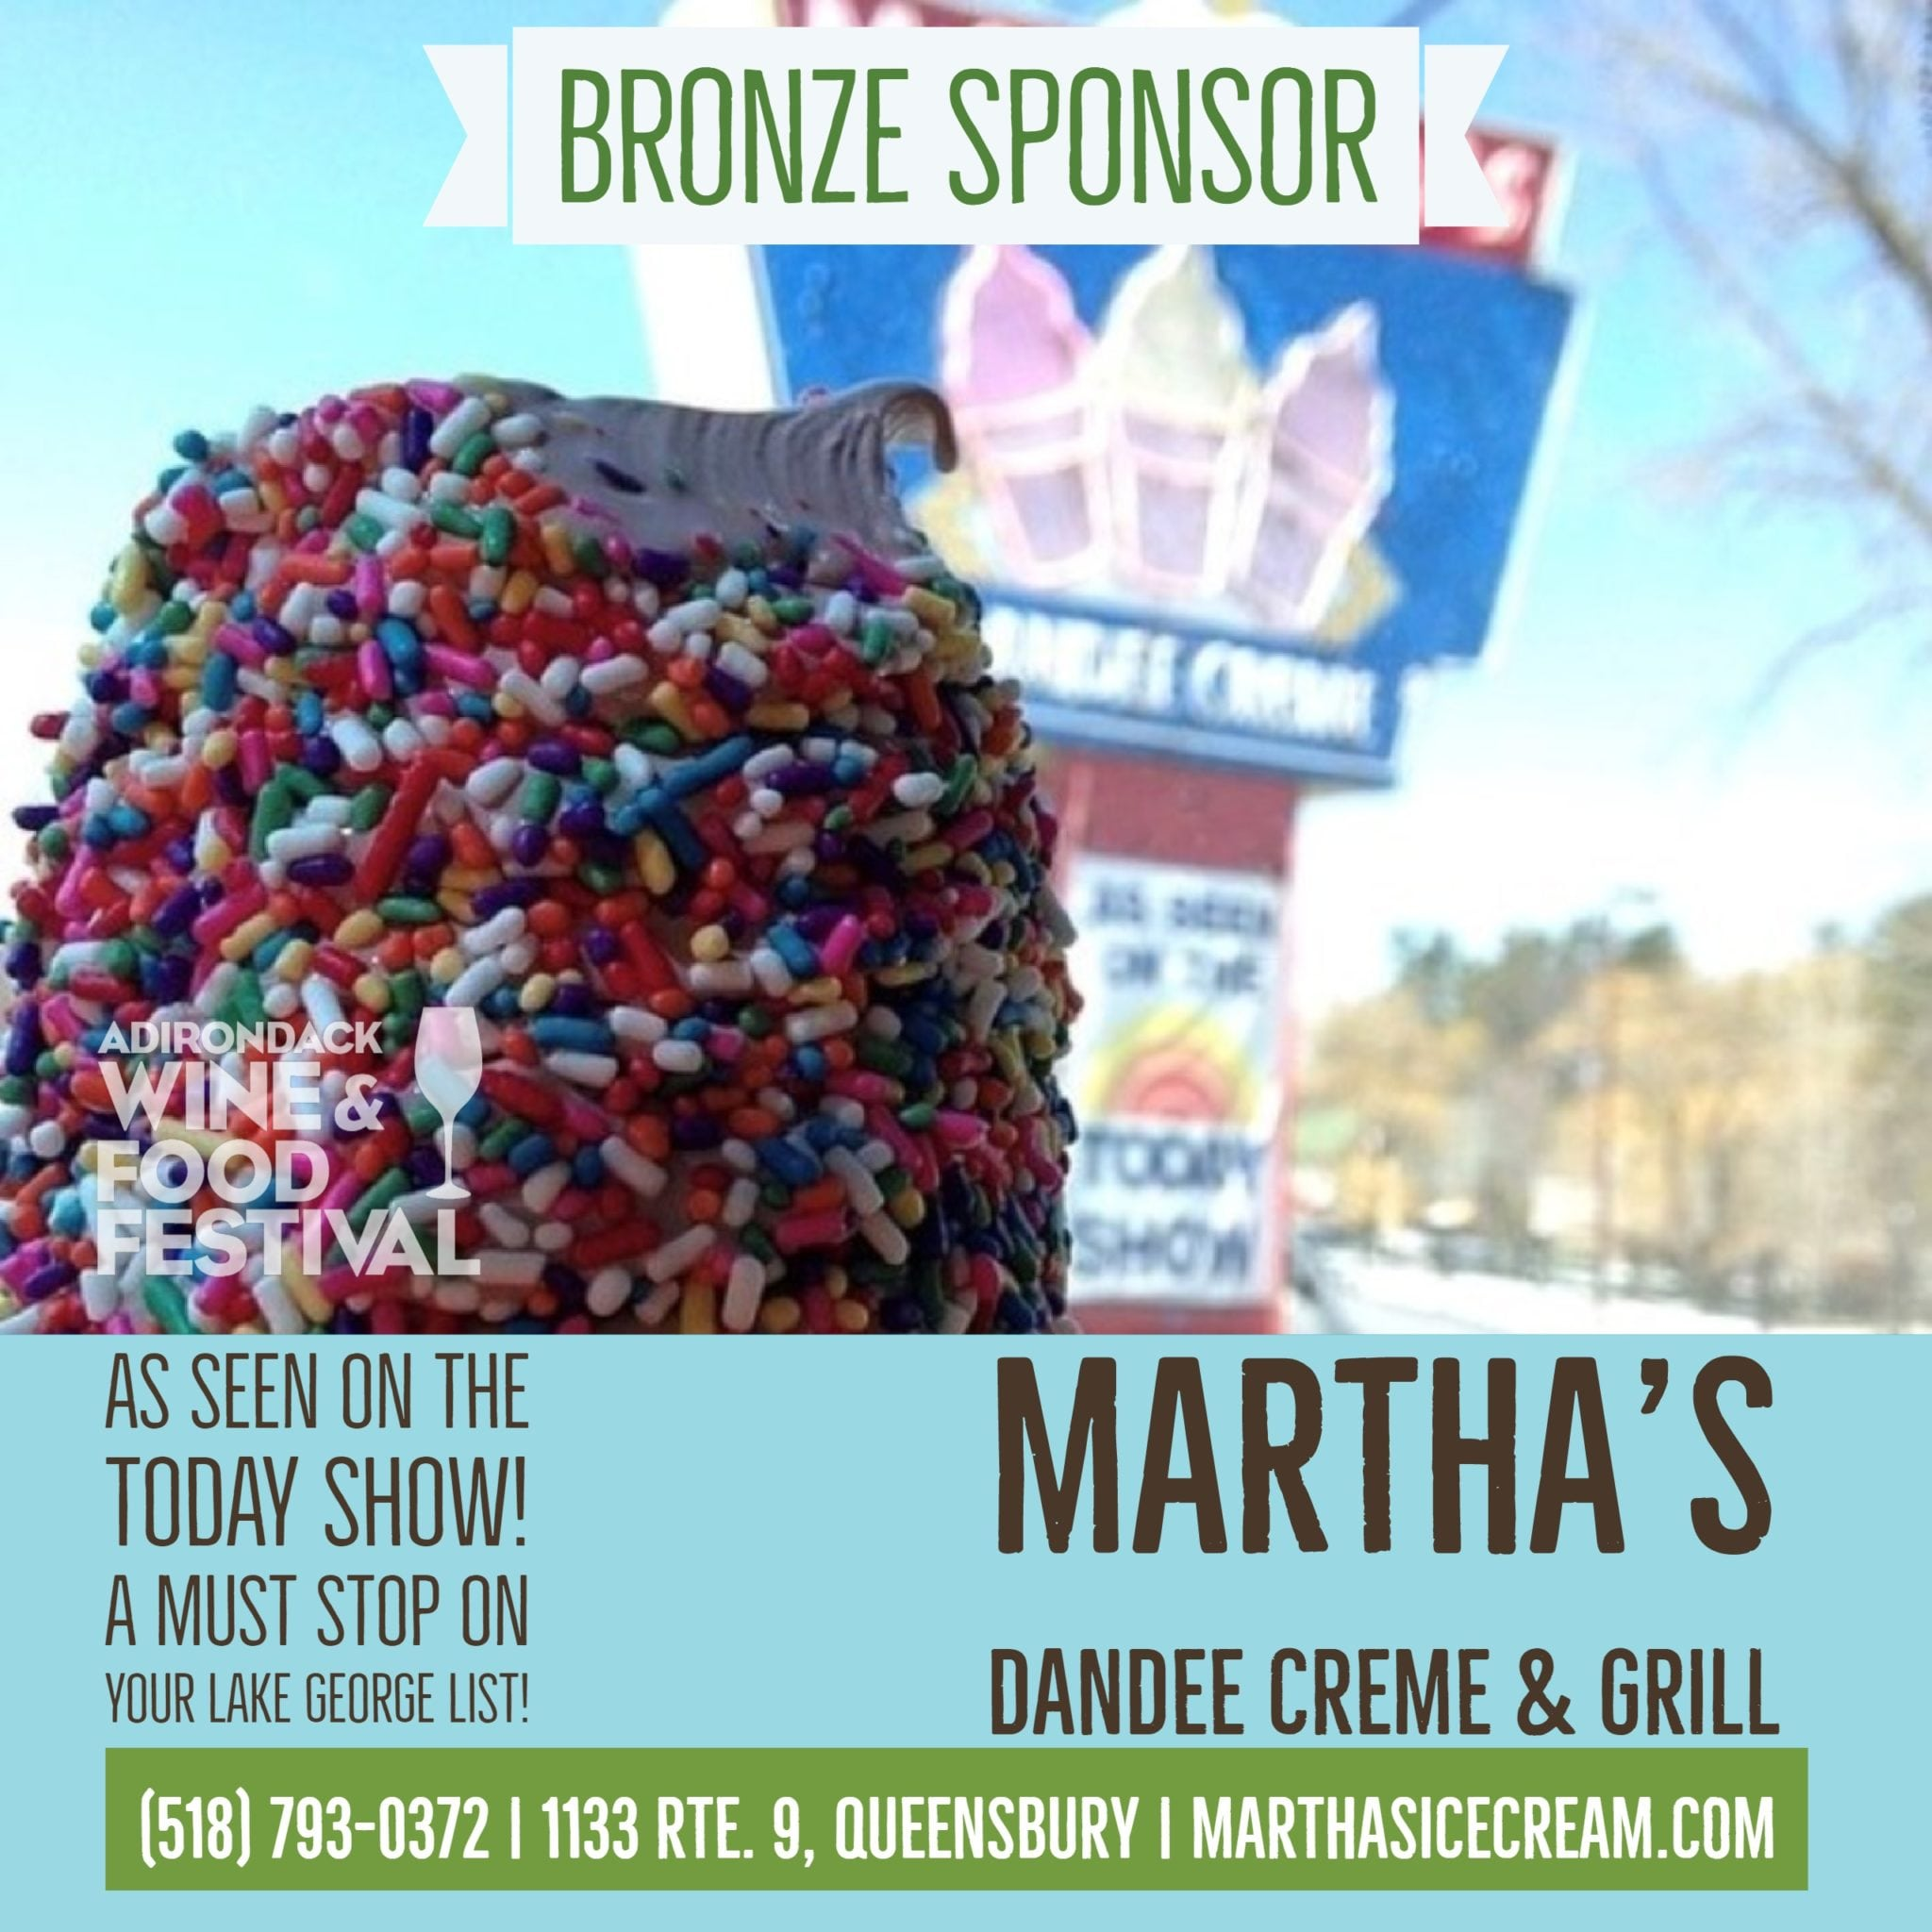 Marthas Dandee Creme & Grill